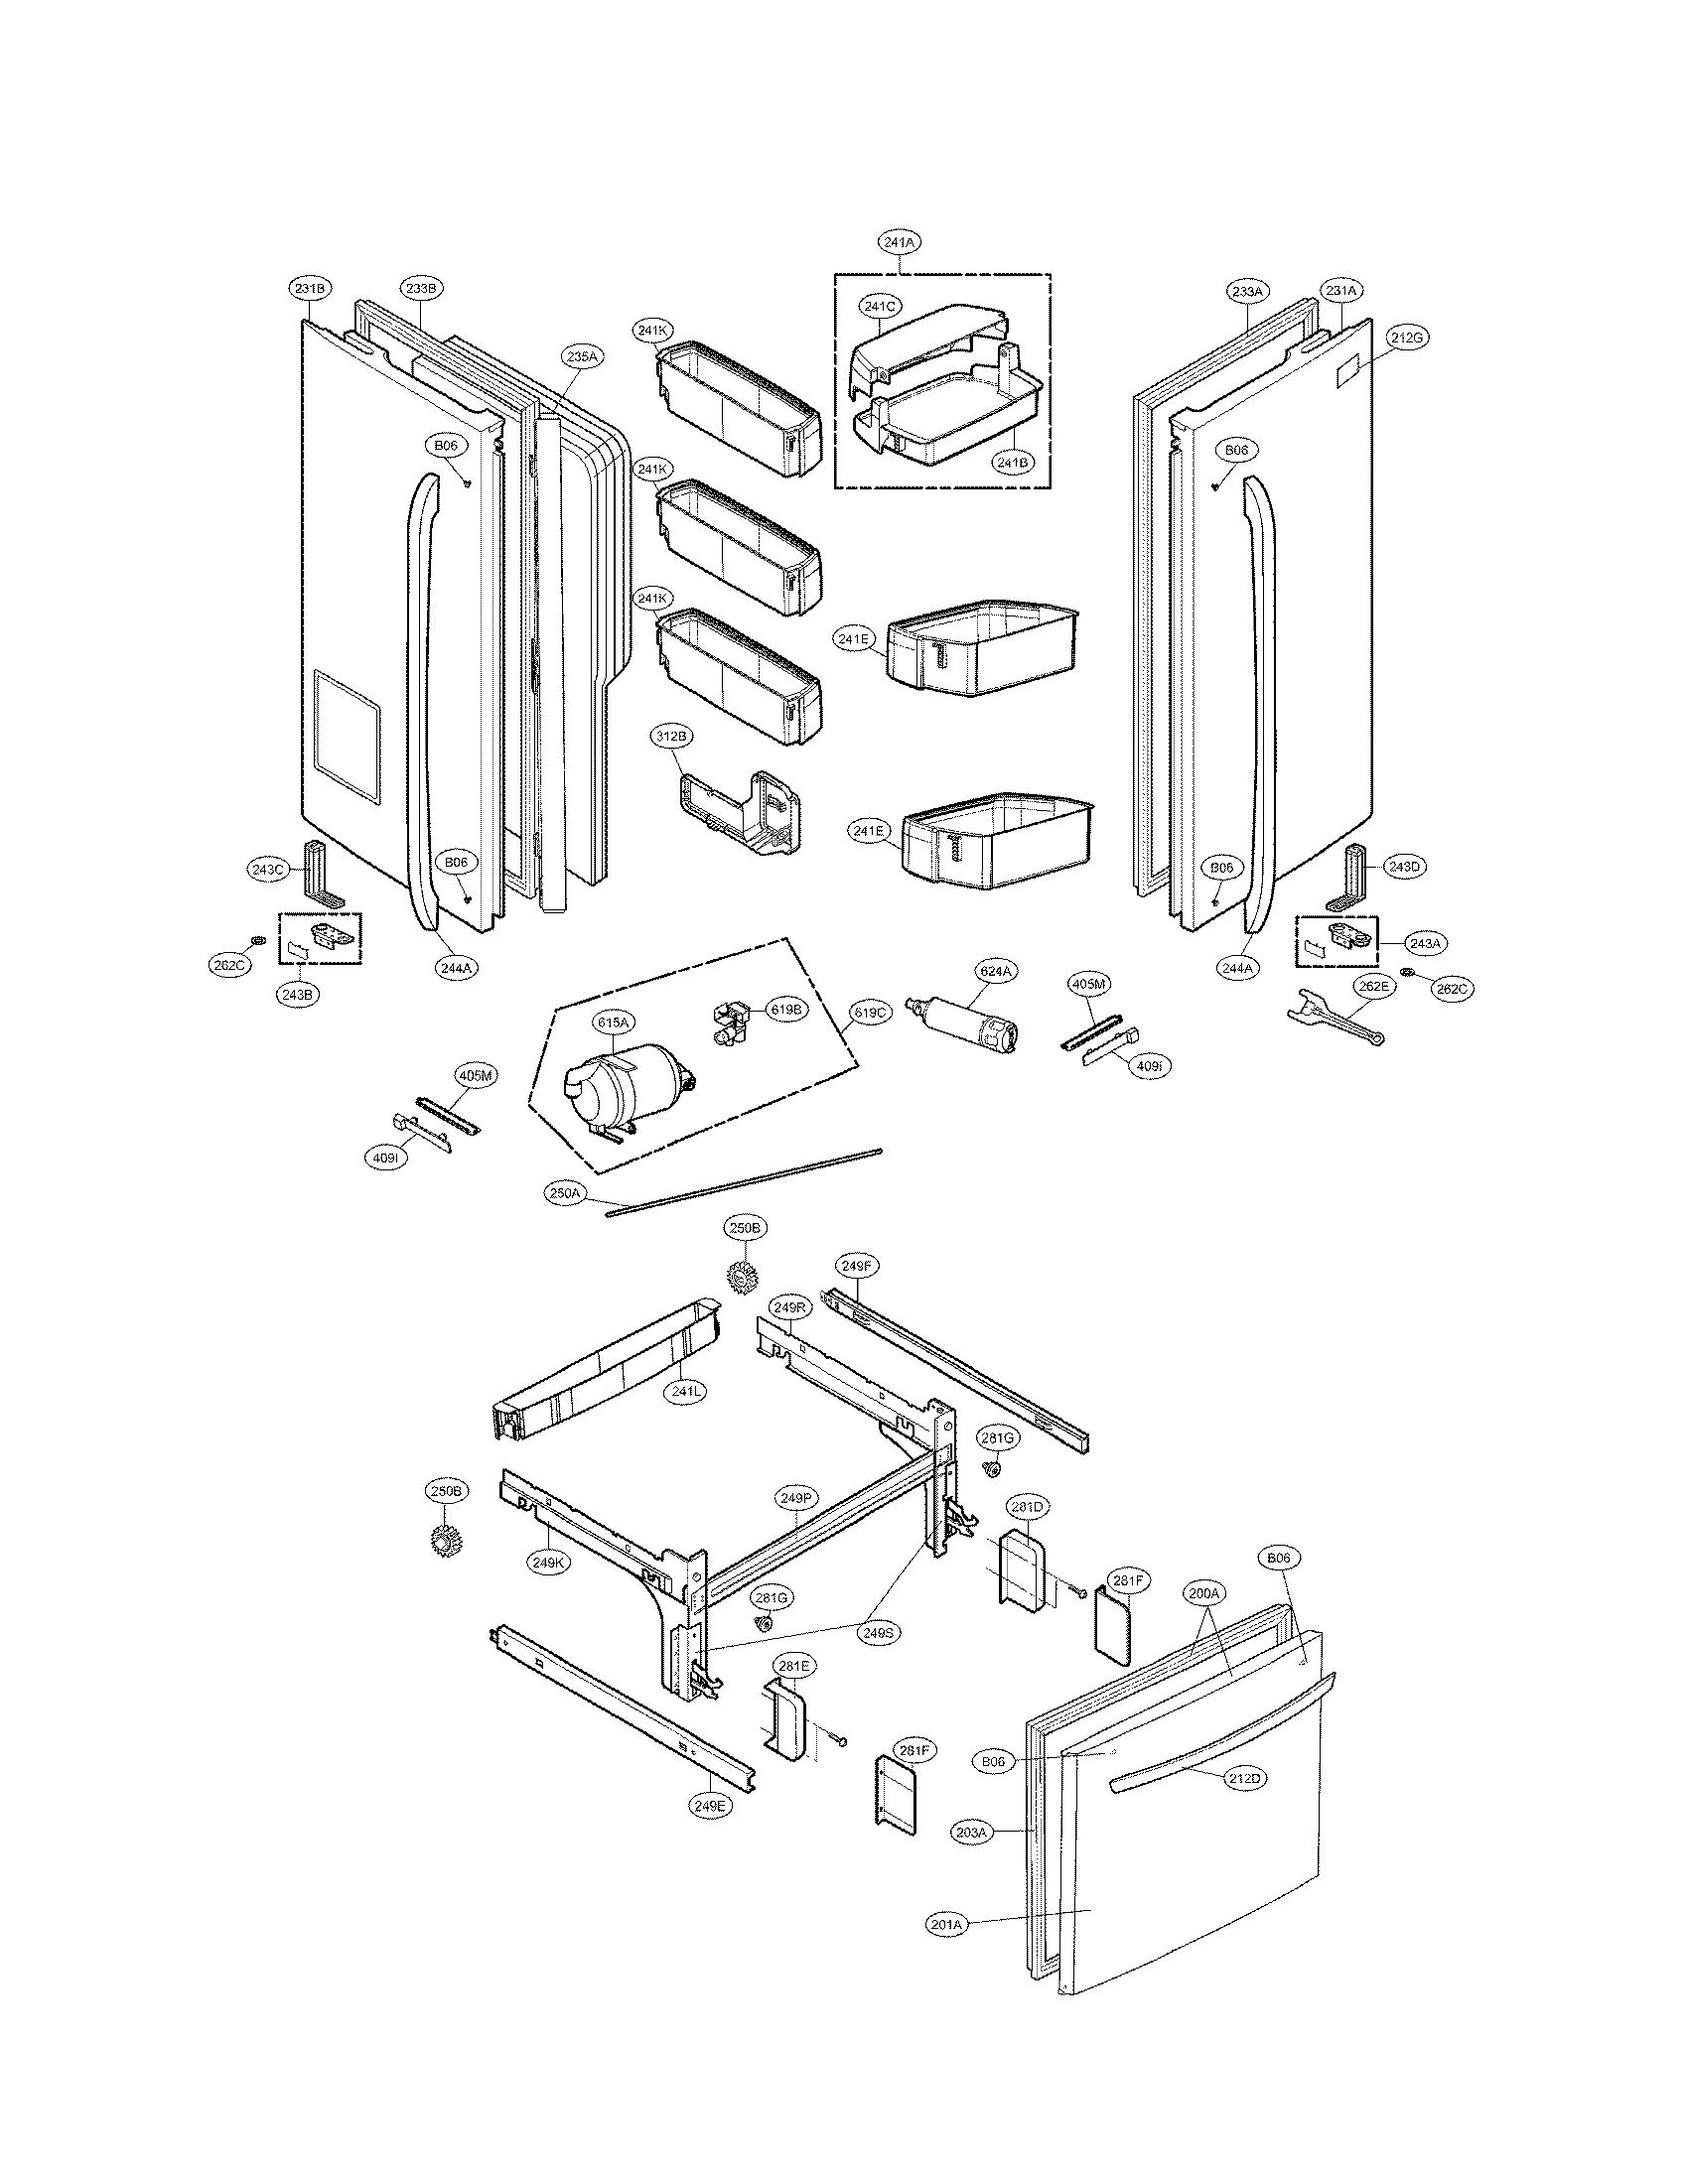 Kenmore-Elite model 79572059112 bottom-mount refrigerator